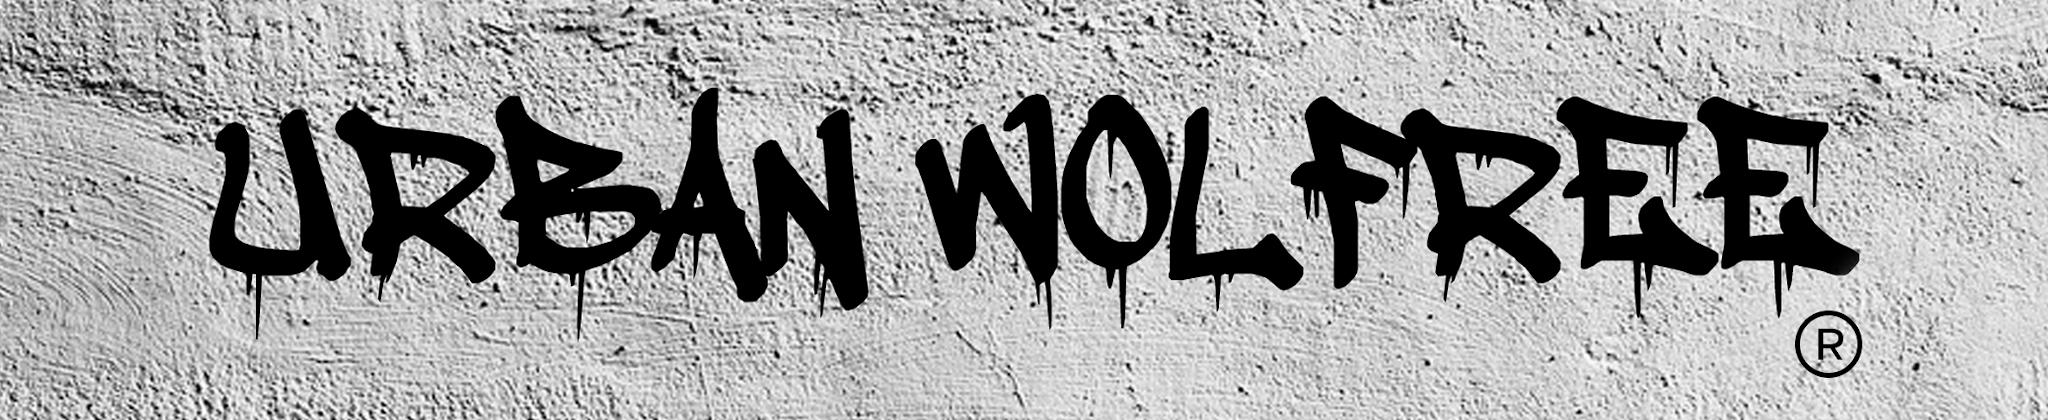 Urban Wolfree